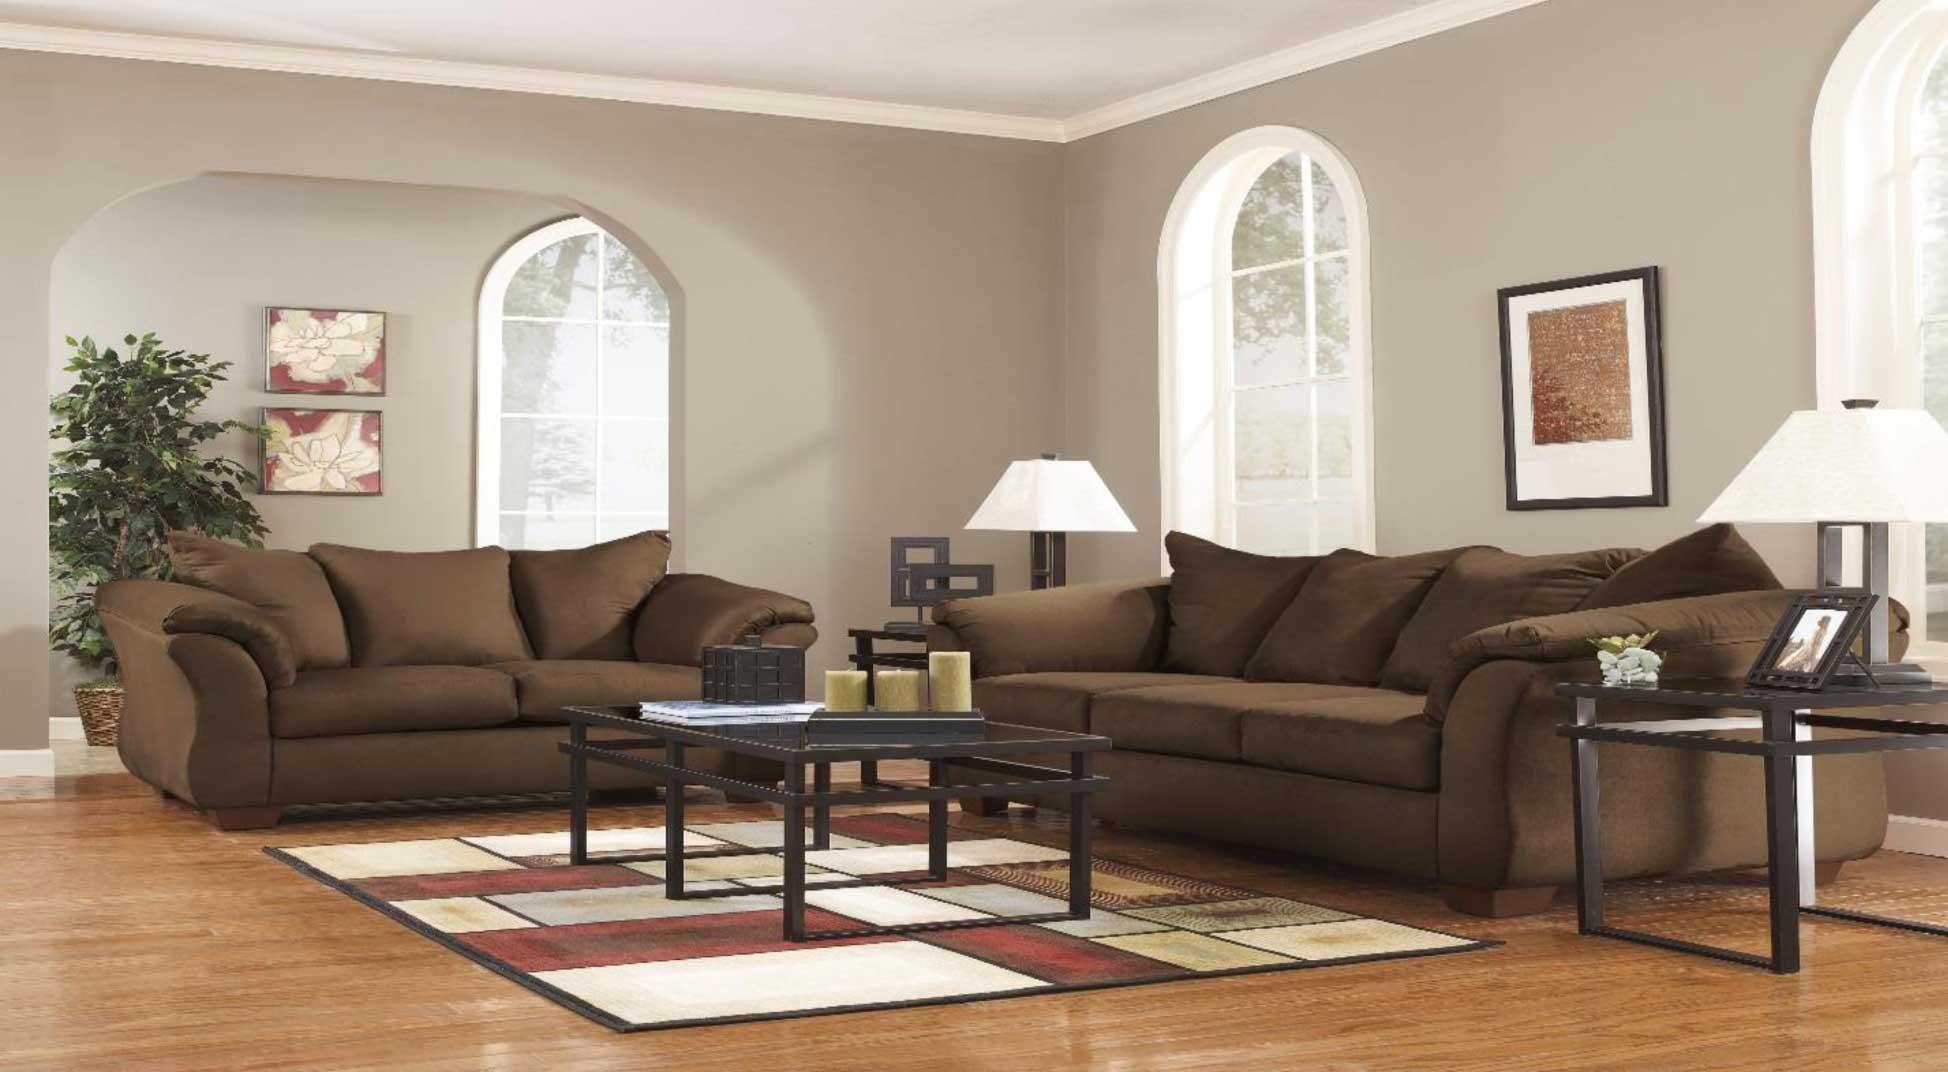 Budget/Student Living Room 1